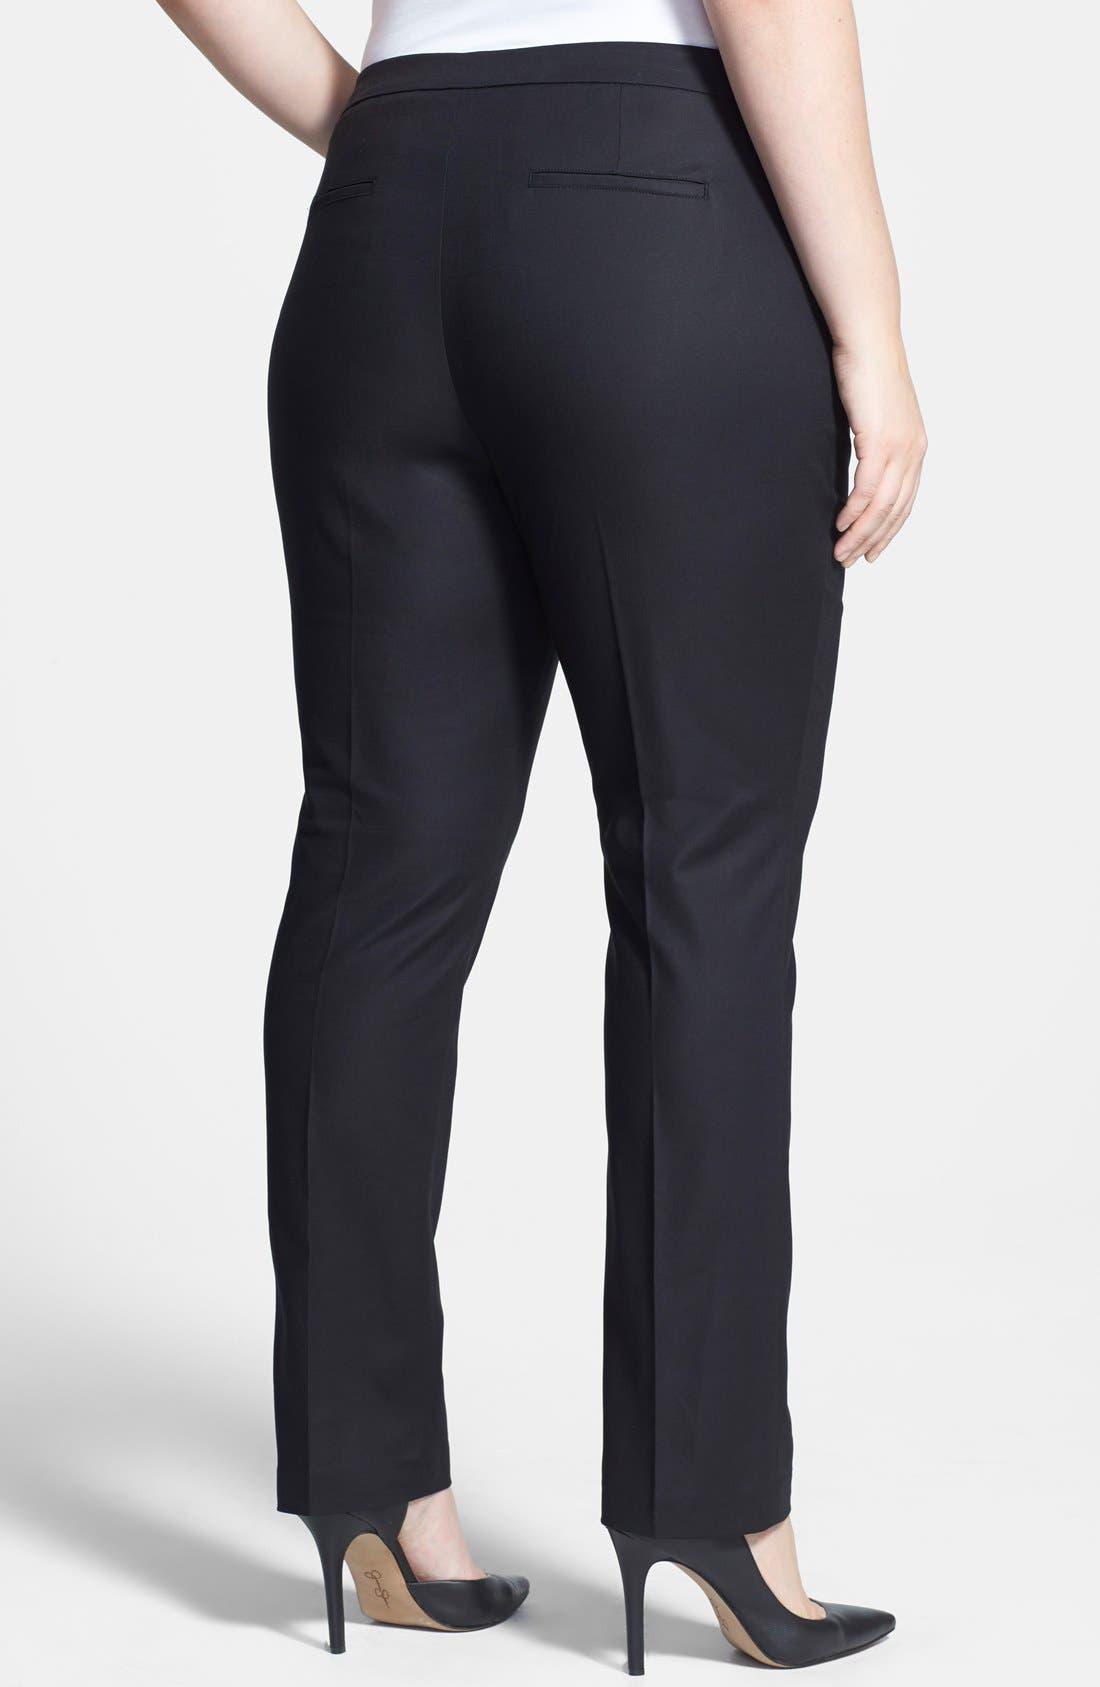 'The Perfect' Pants,                             Alternate thumbnail 2, color,                             Black Onyx